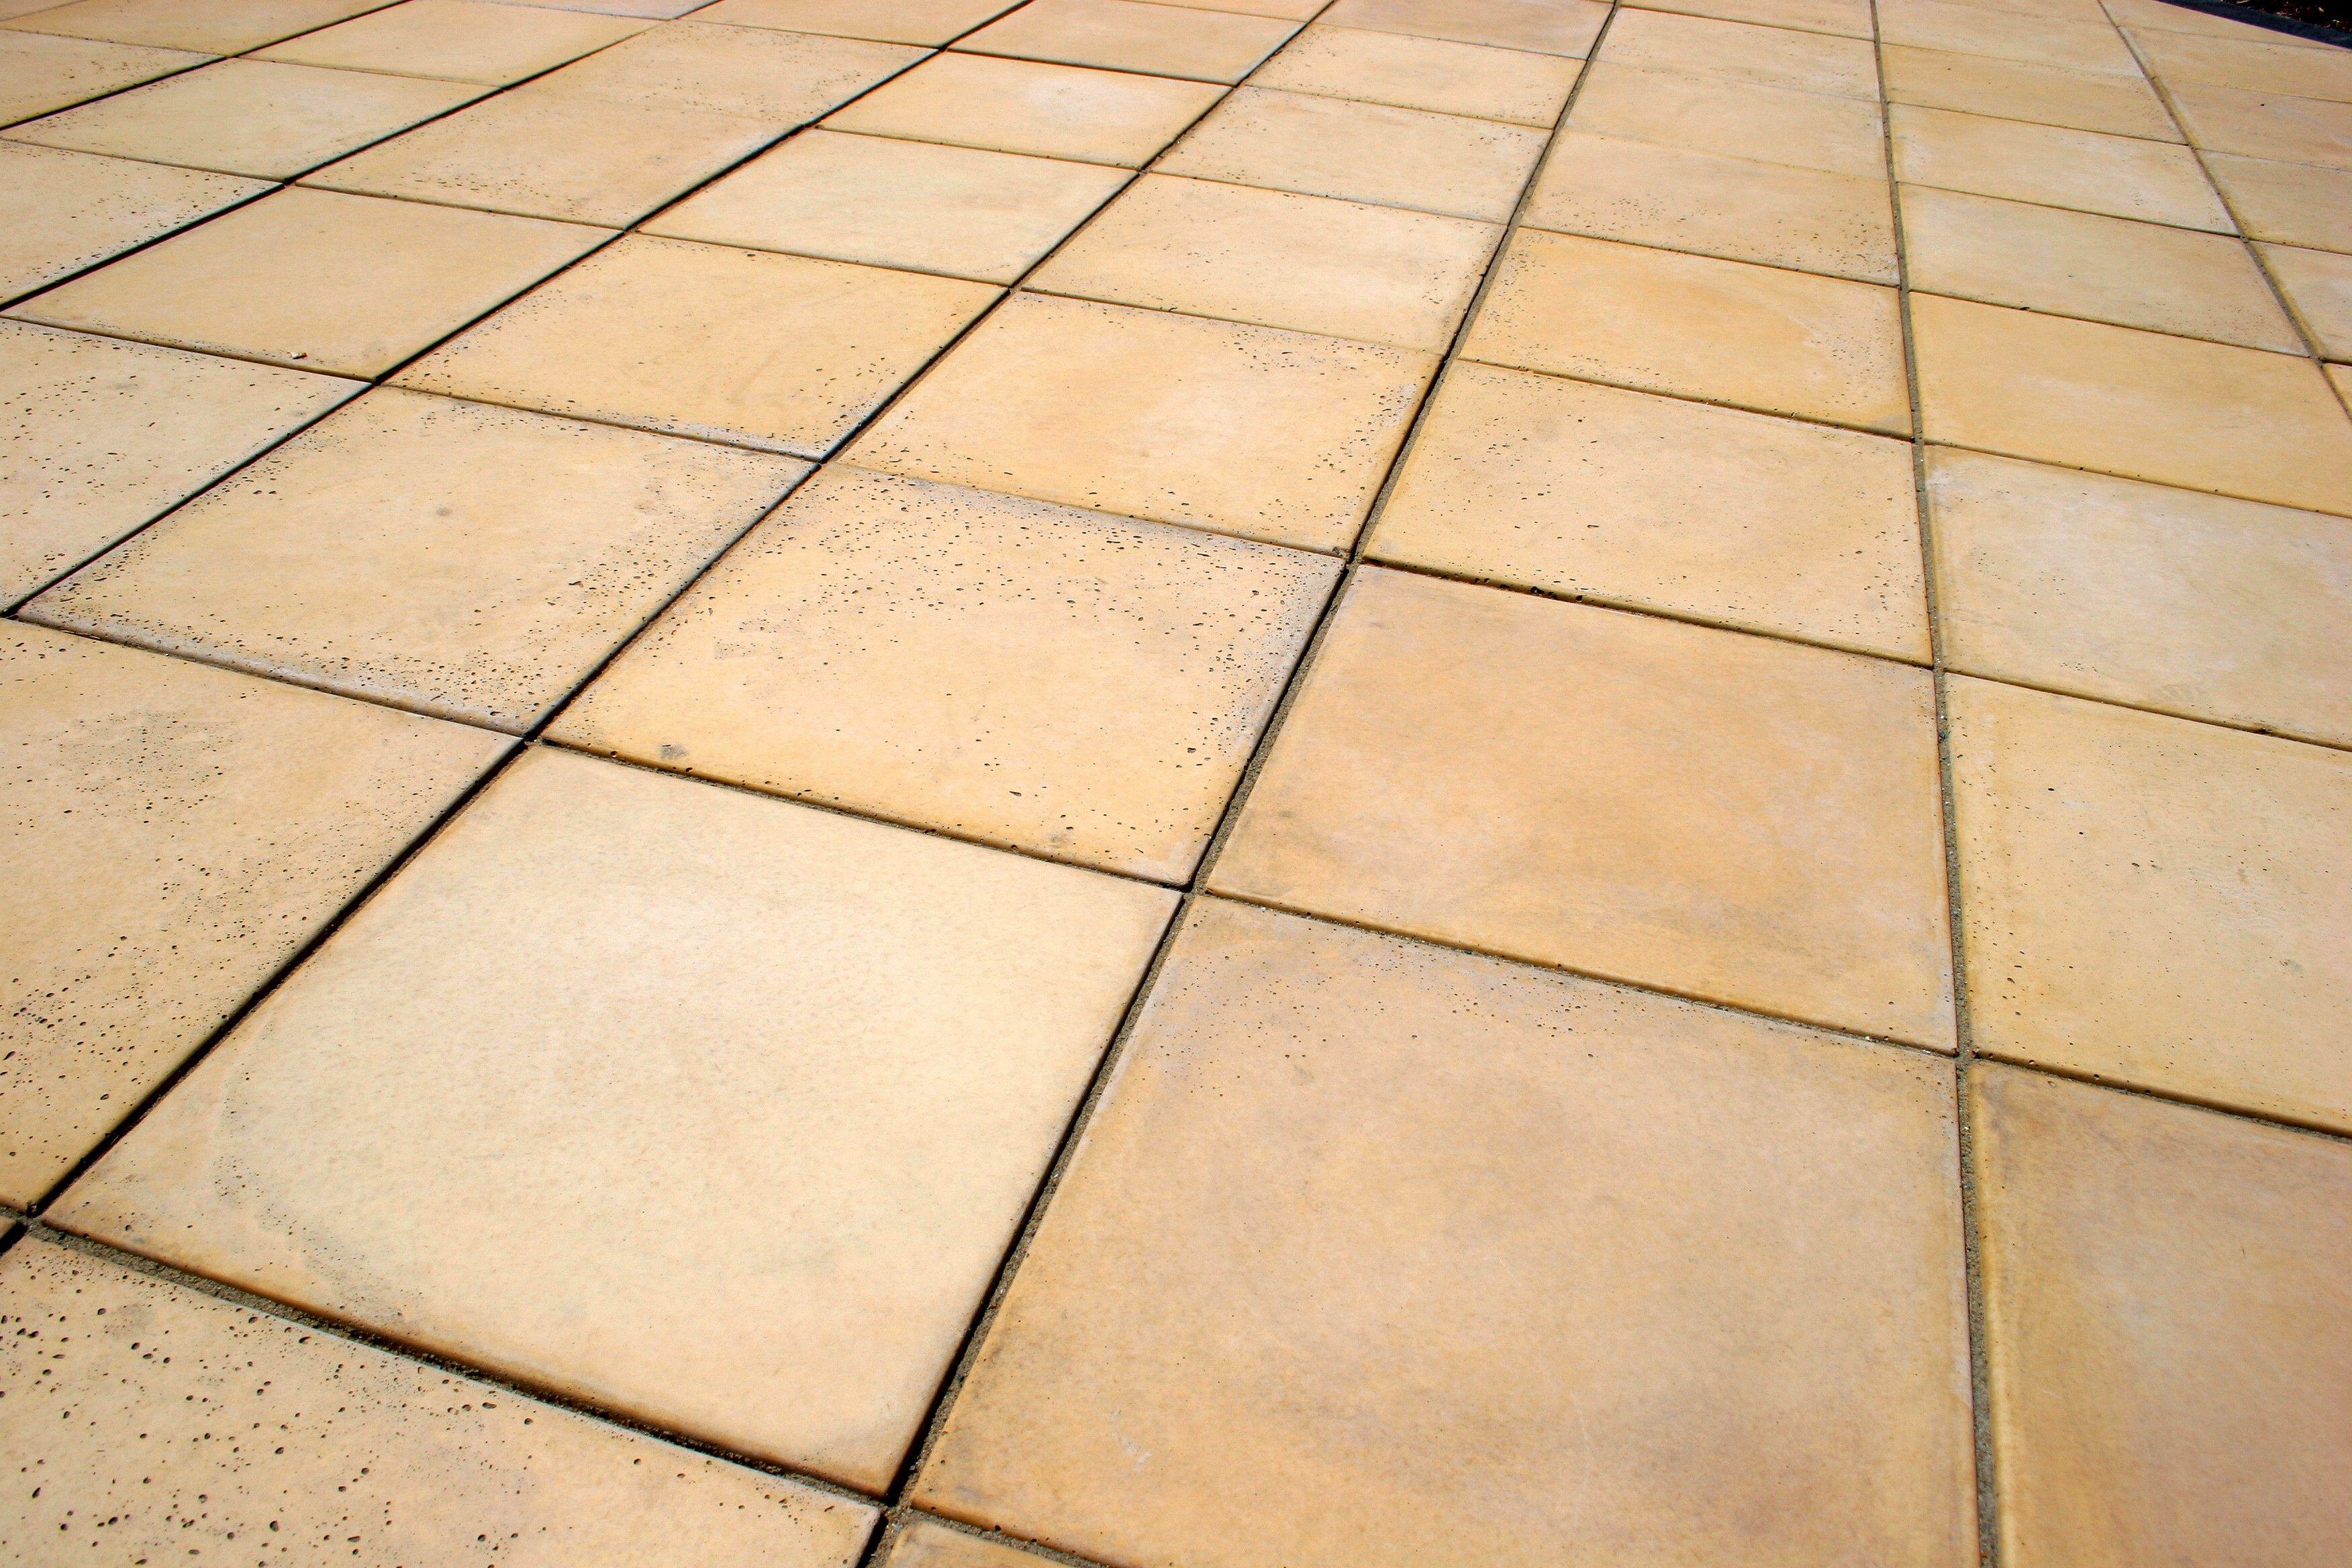 Sandstone bathroom tiles dailygadgetfo Images